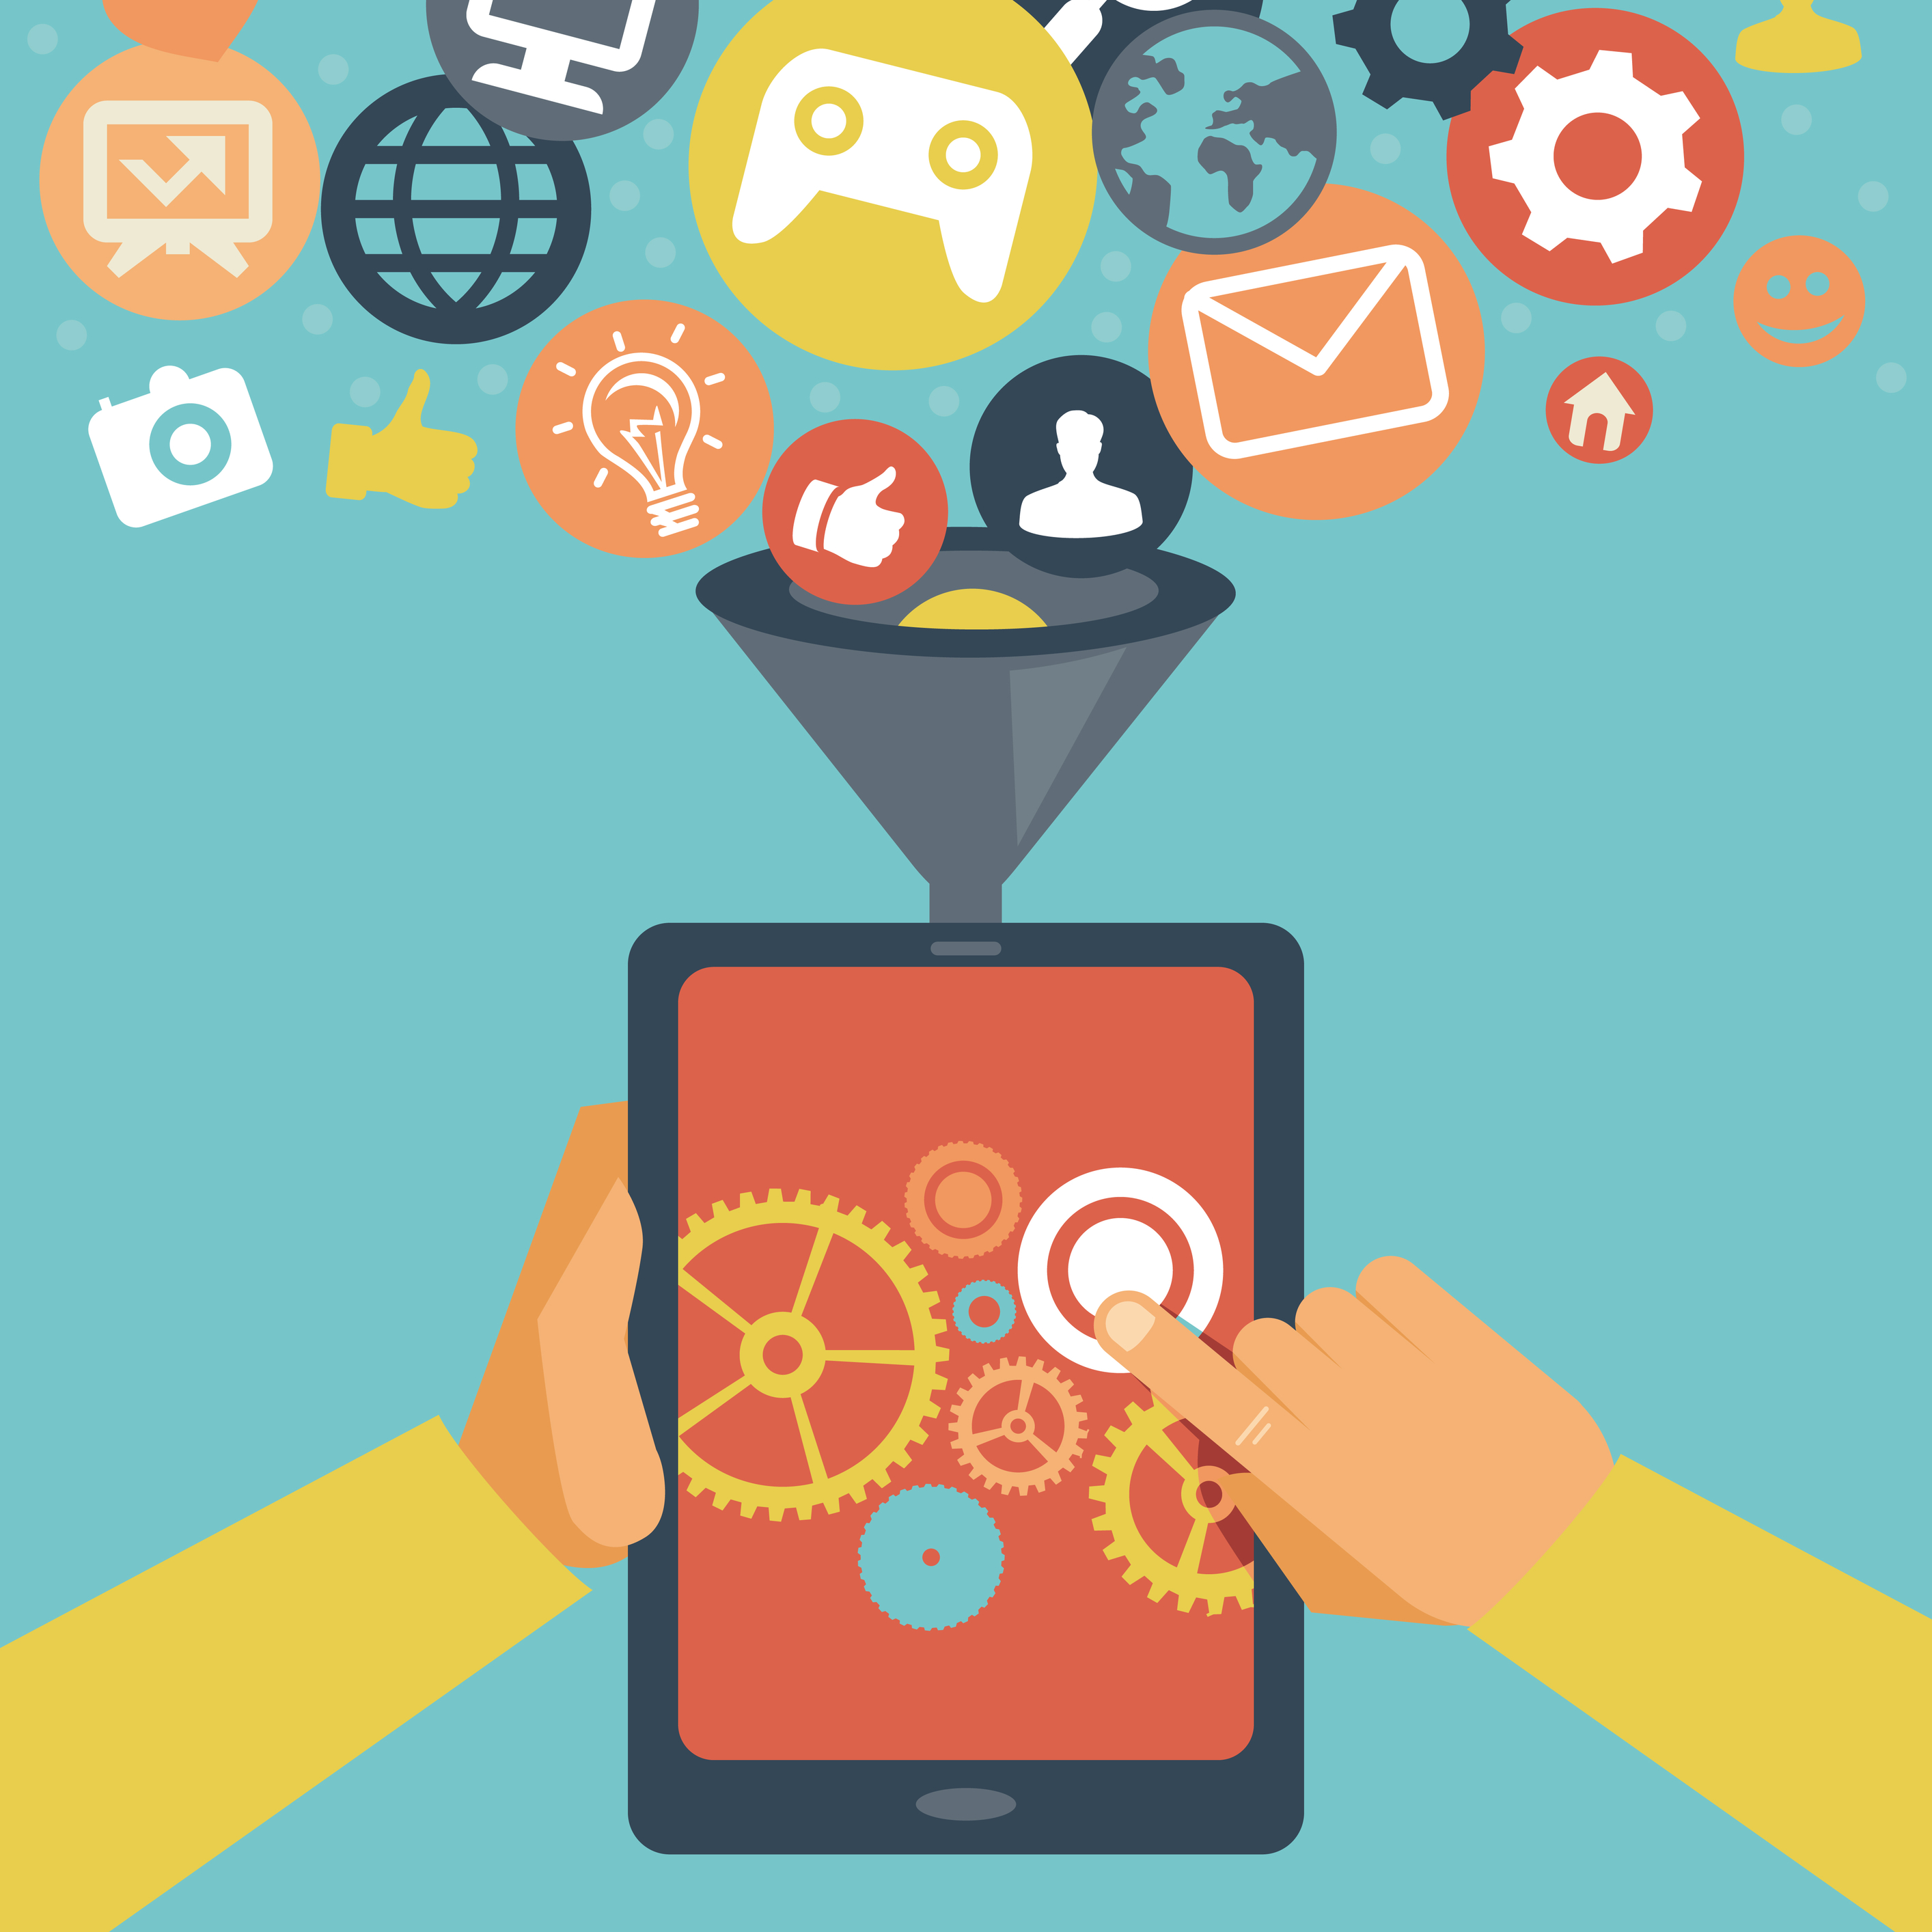 7 tips for developing cross platform apps